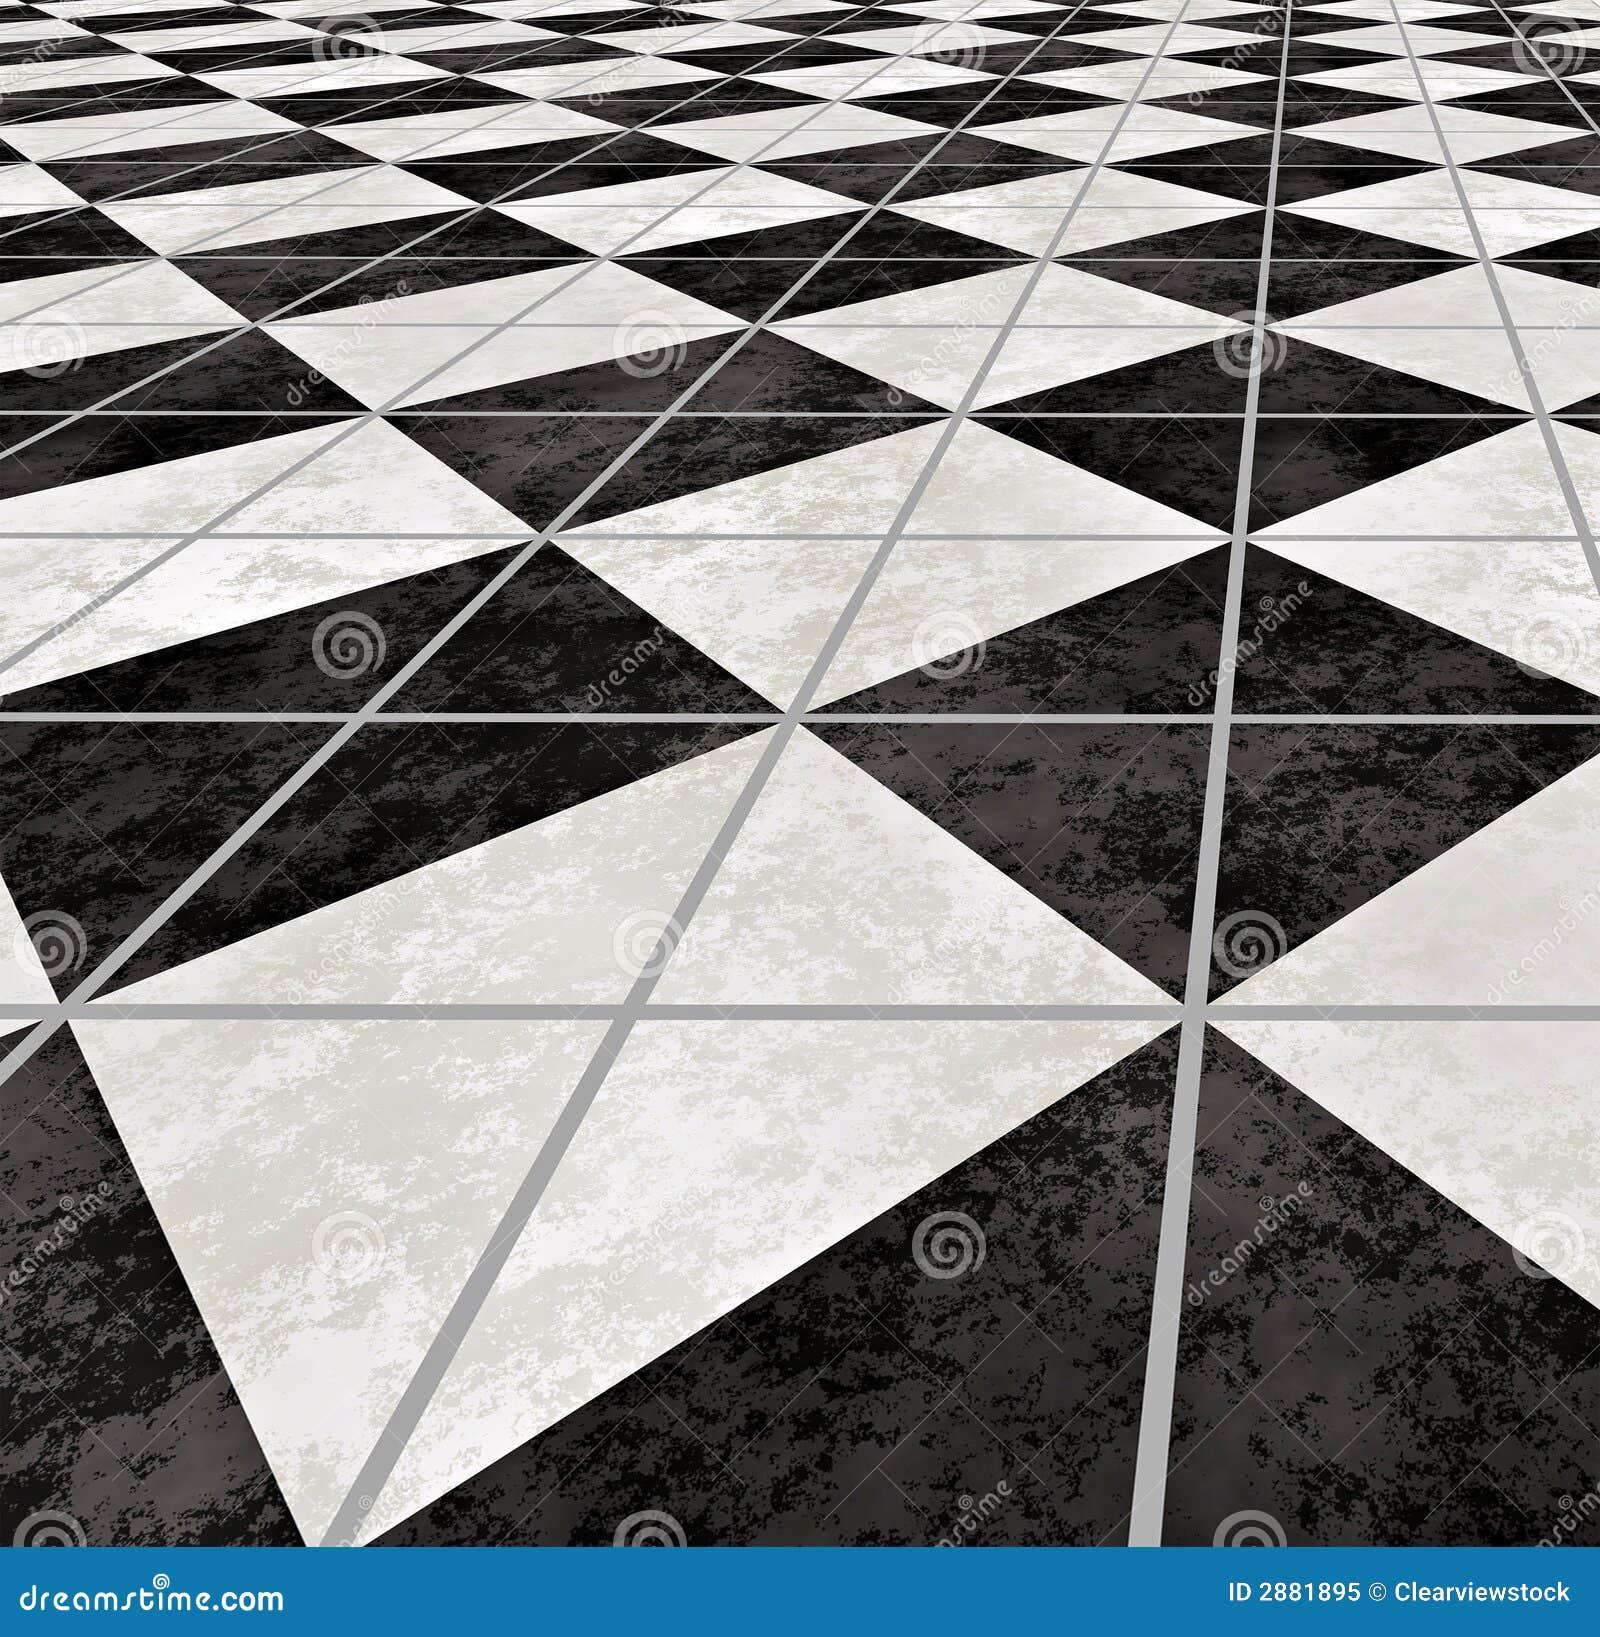 Marble Tiled Floor Flooring Royalty Free Stock Photo - Image: 2881895